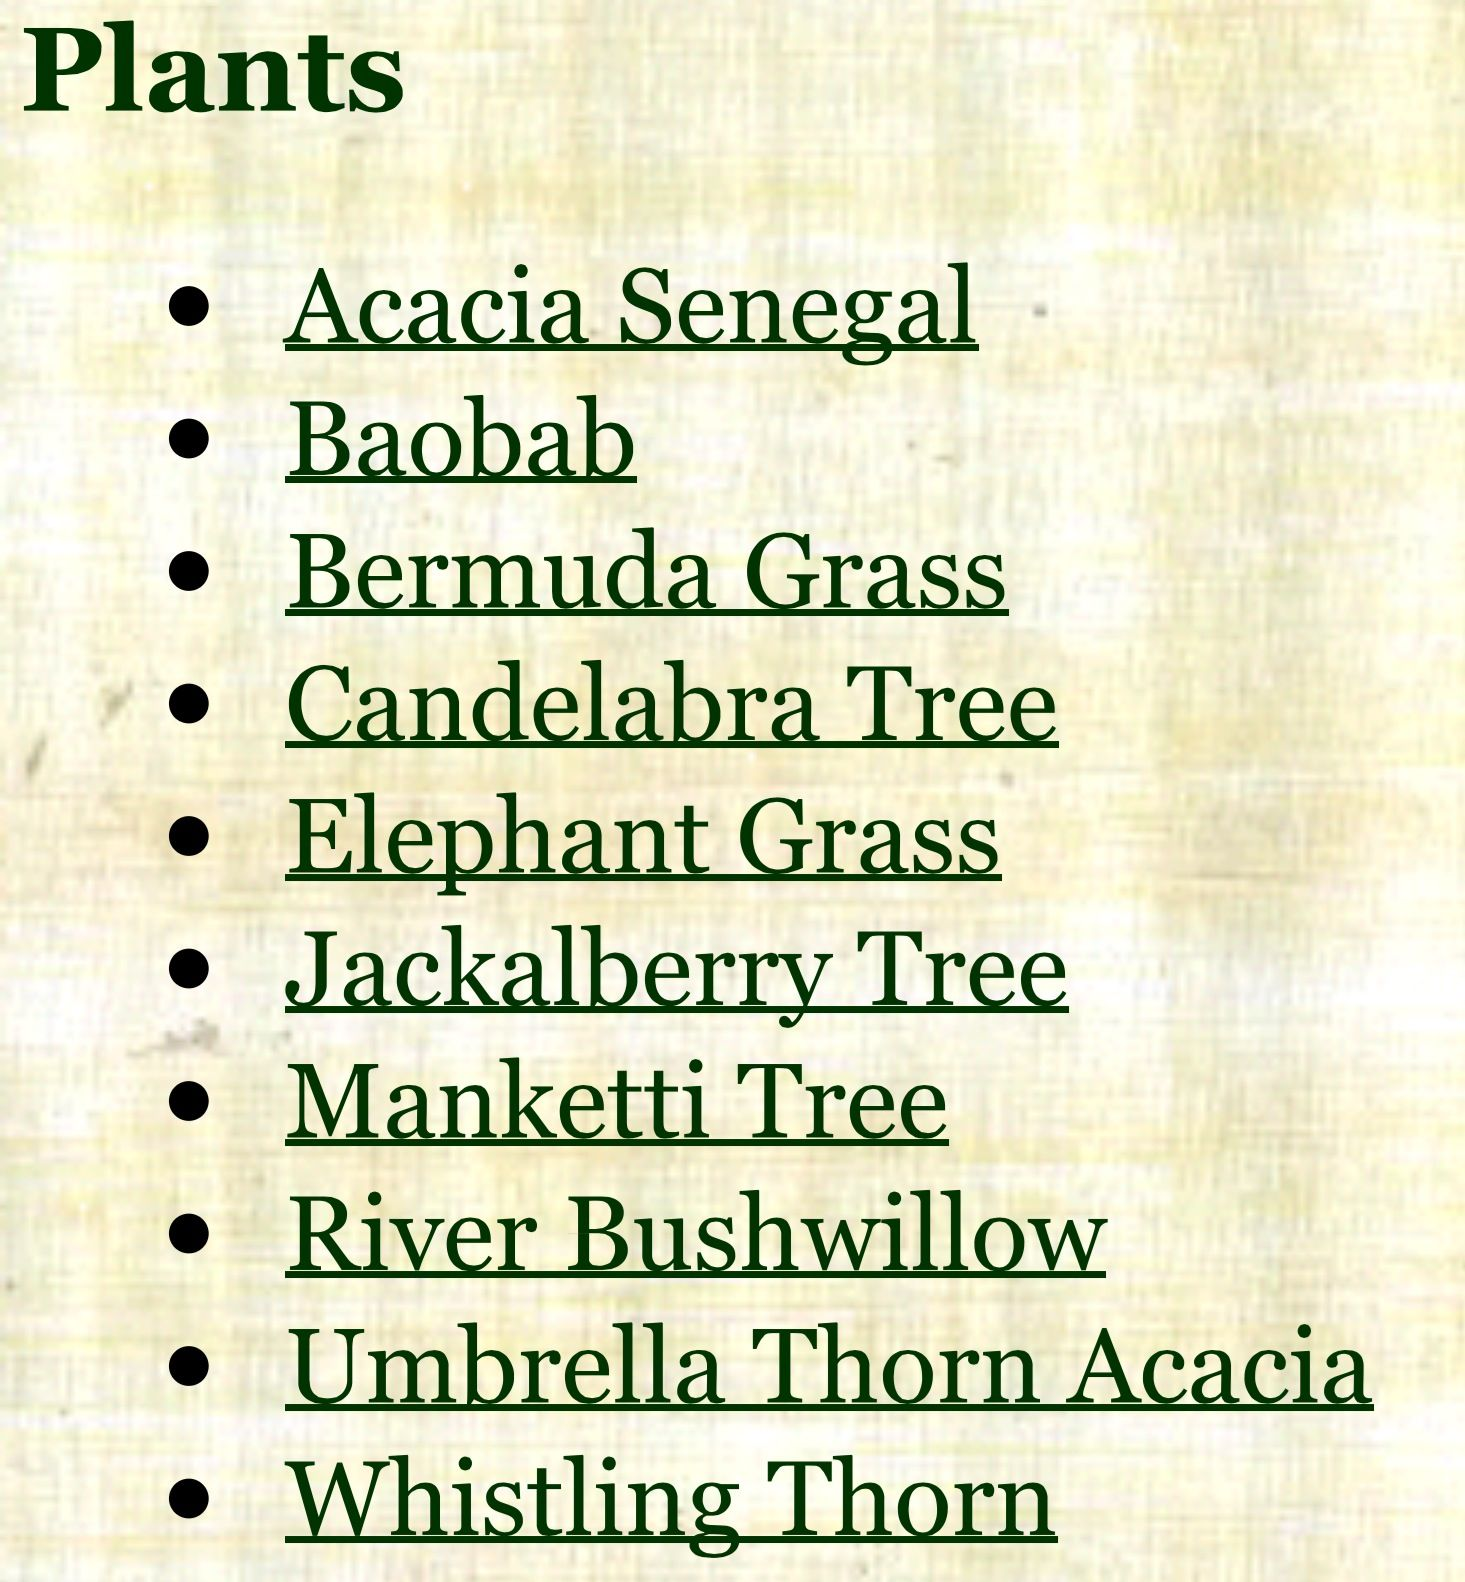 Dominant plants in the African Savanna Savanna biome